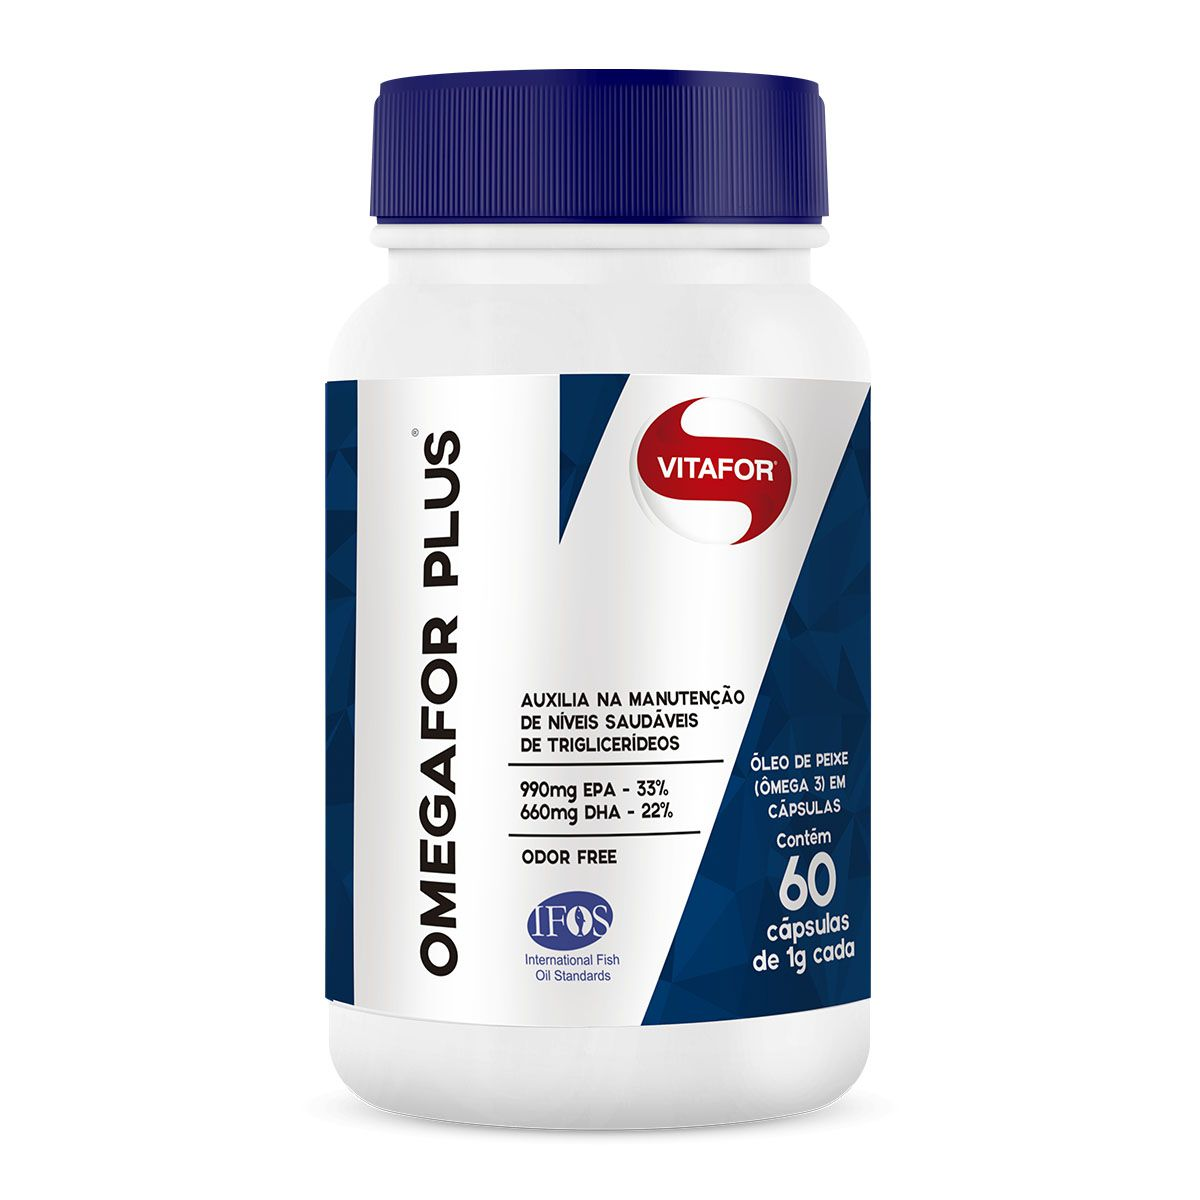 Omegafor Plus 60 Cápsulas - Vitafor